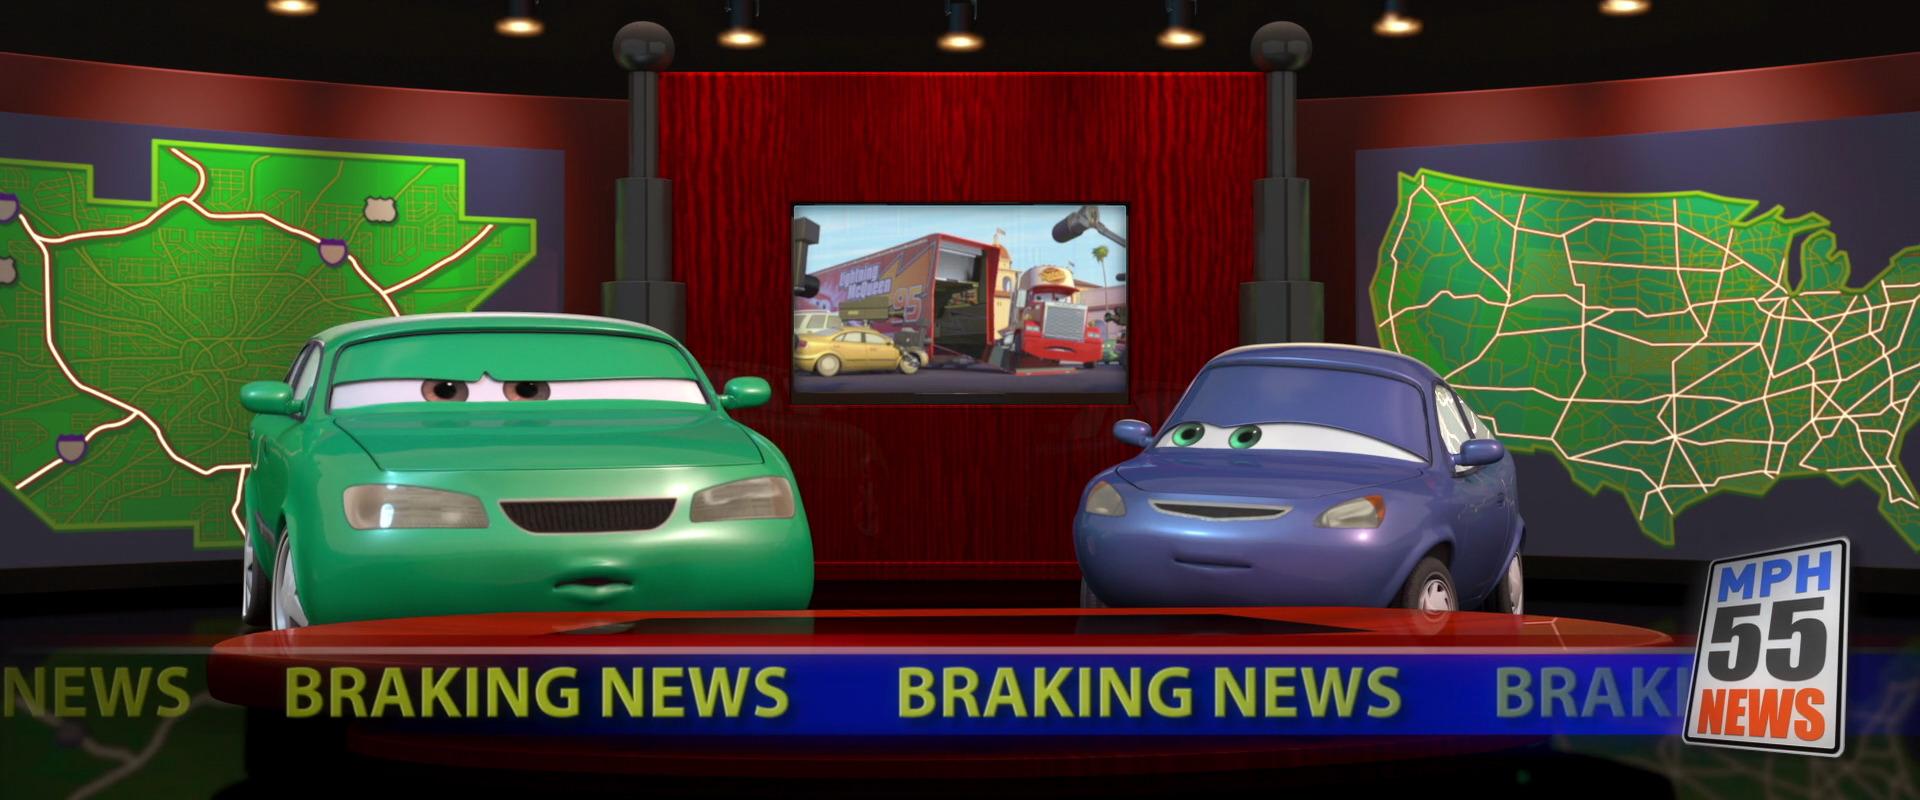 Mph 55 News World Of Cars Wiki Fandom Powered By Wikia